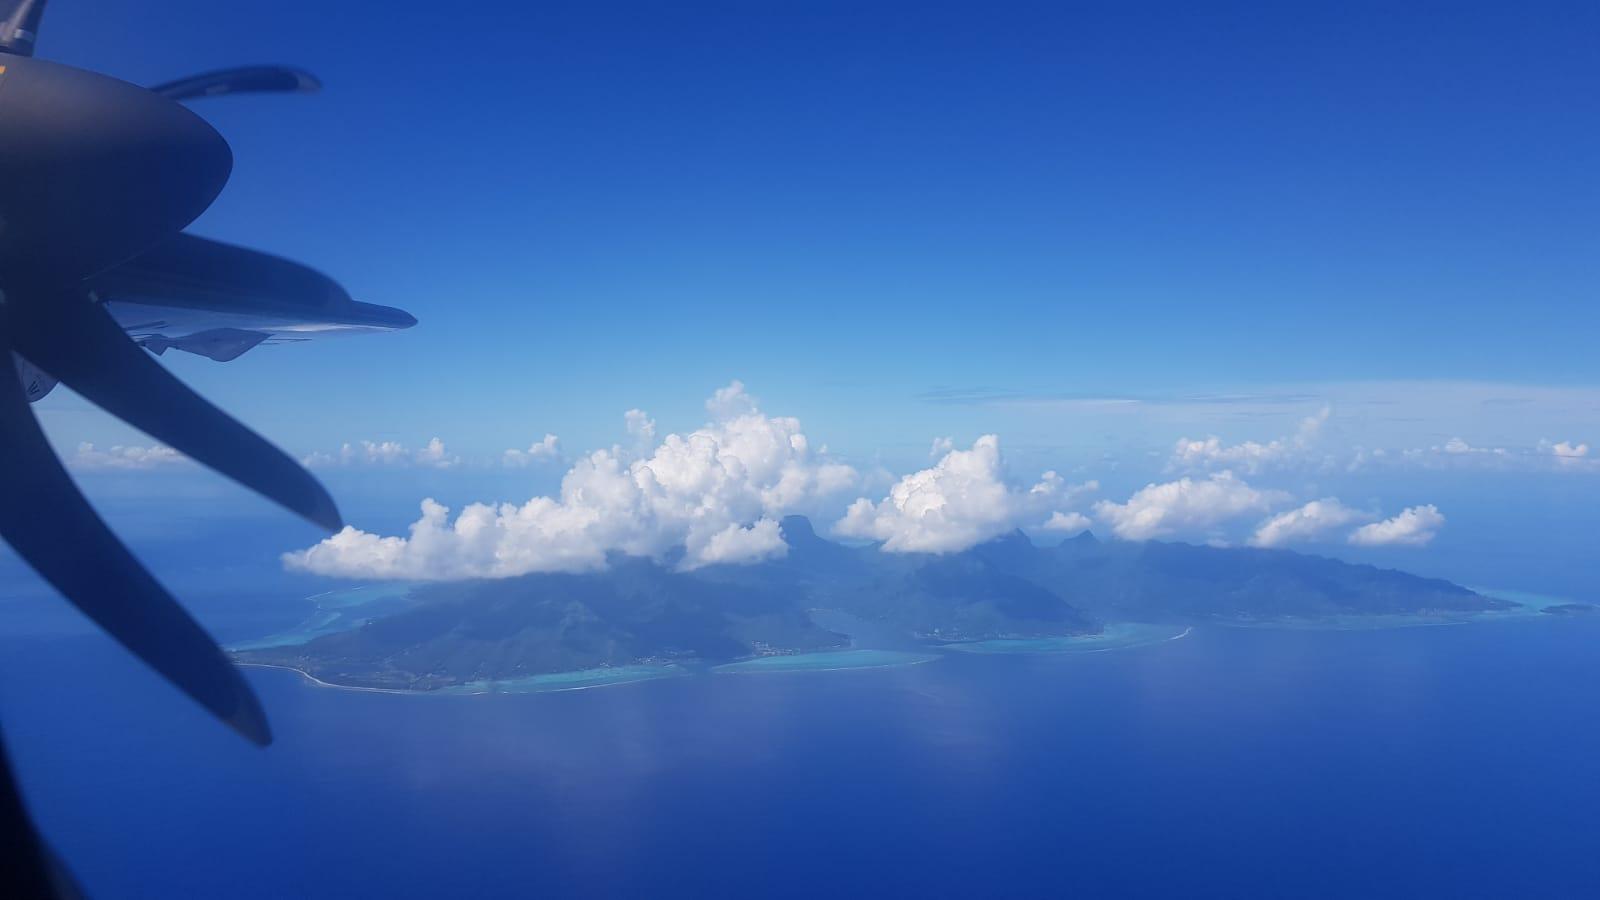 island-image